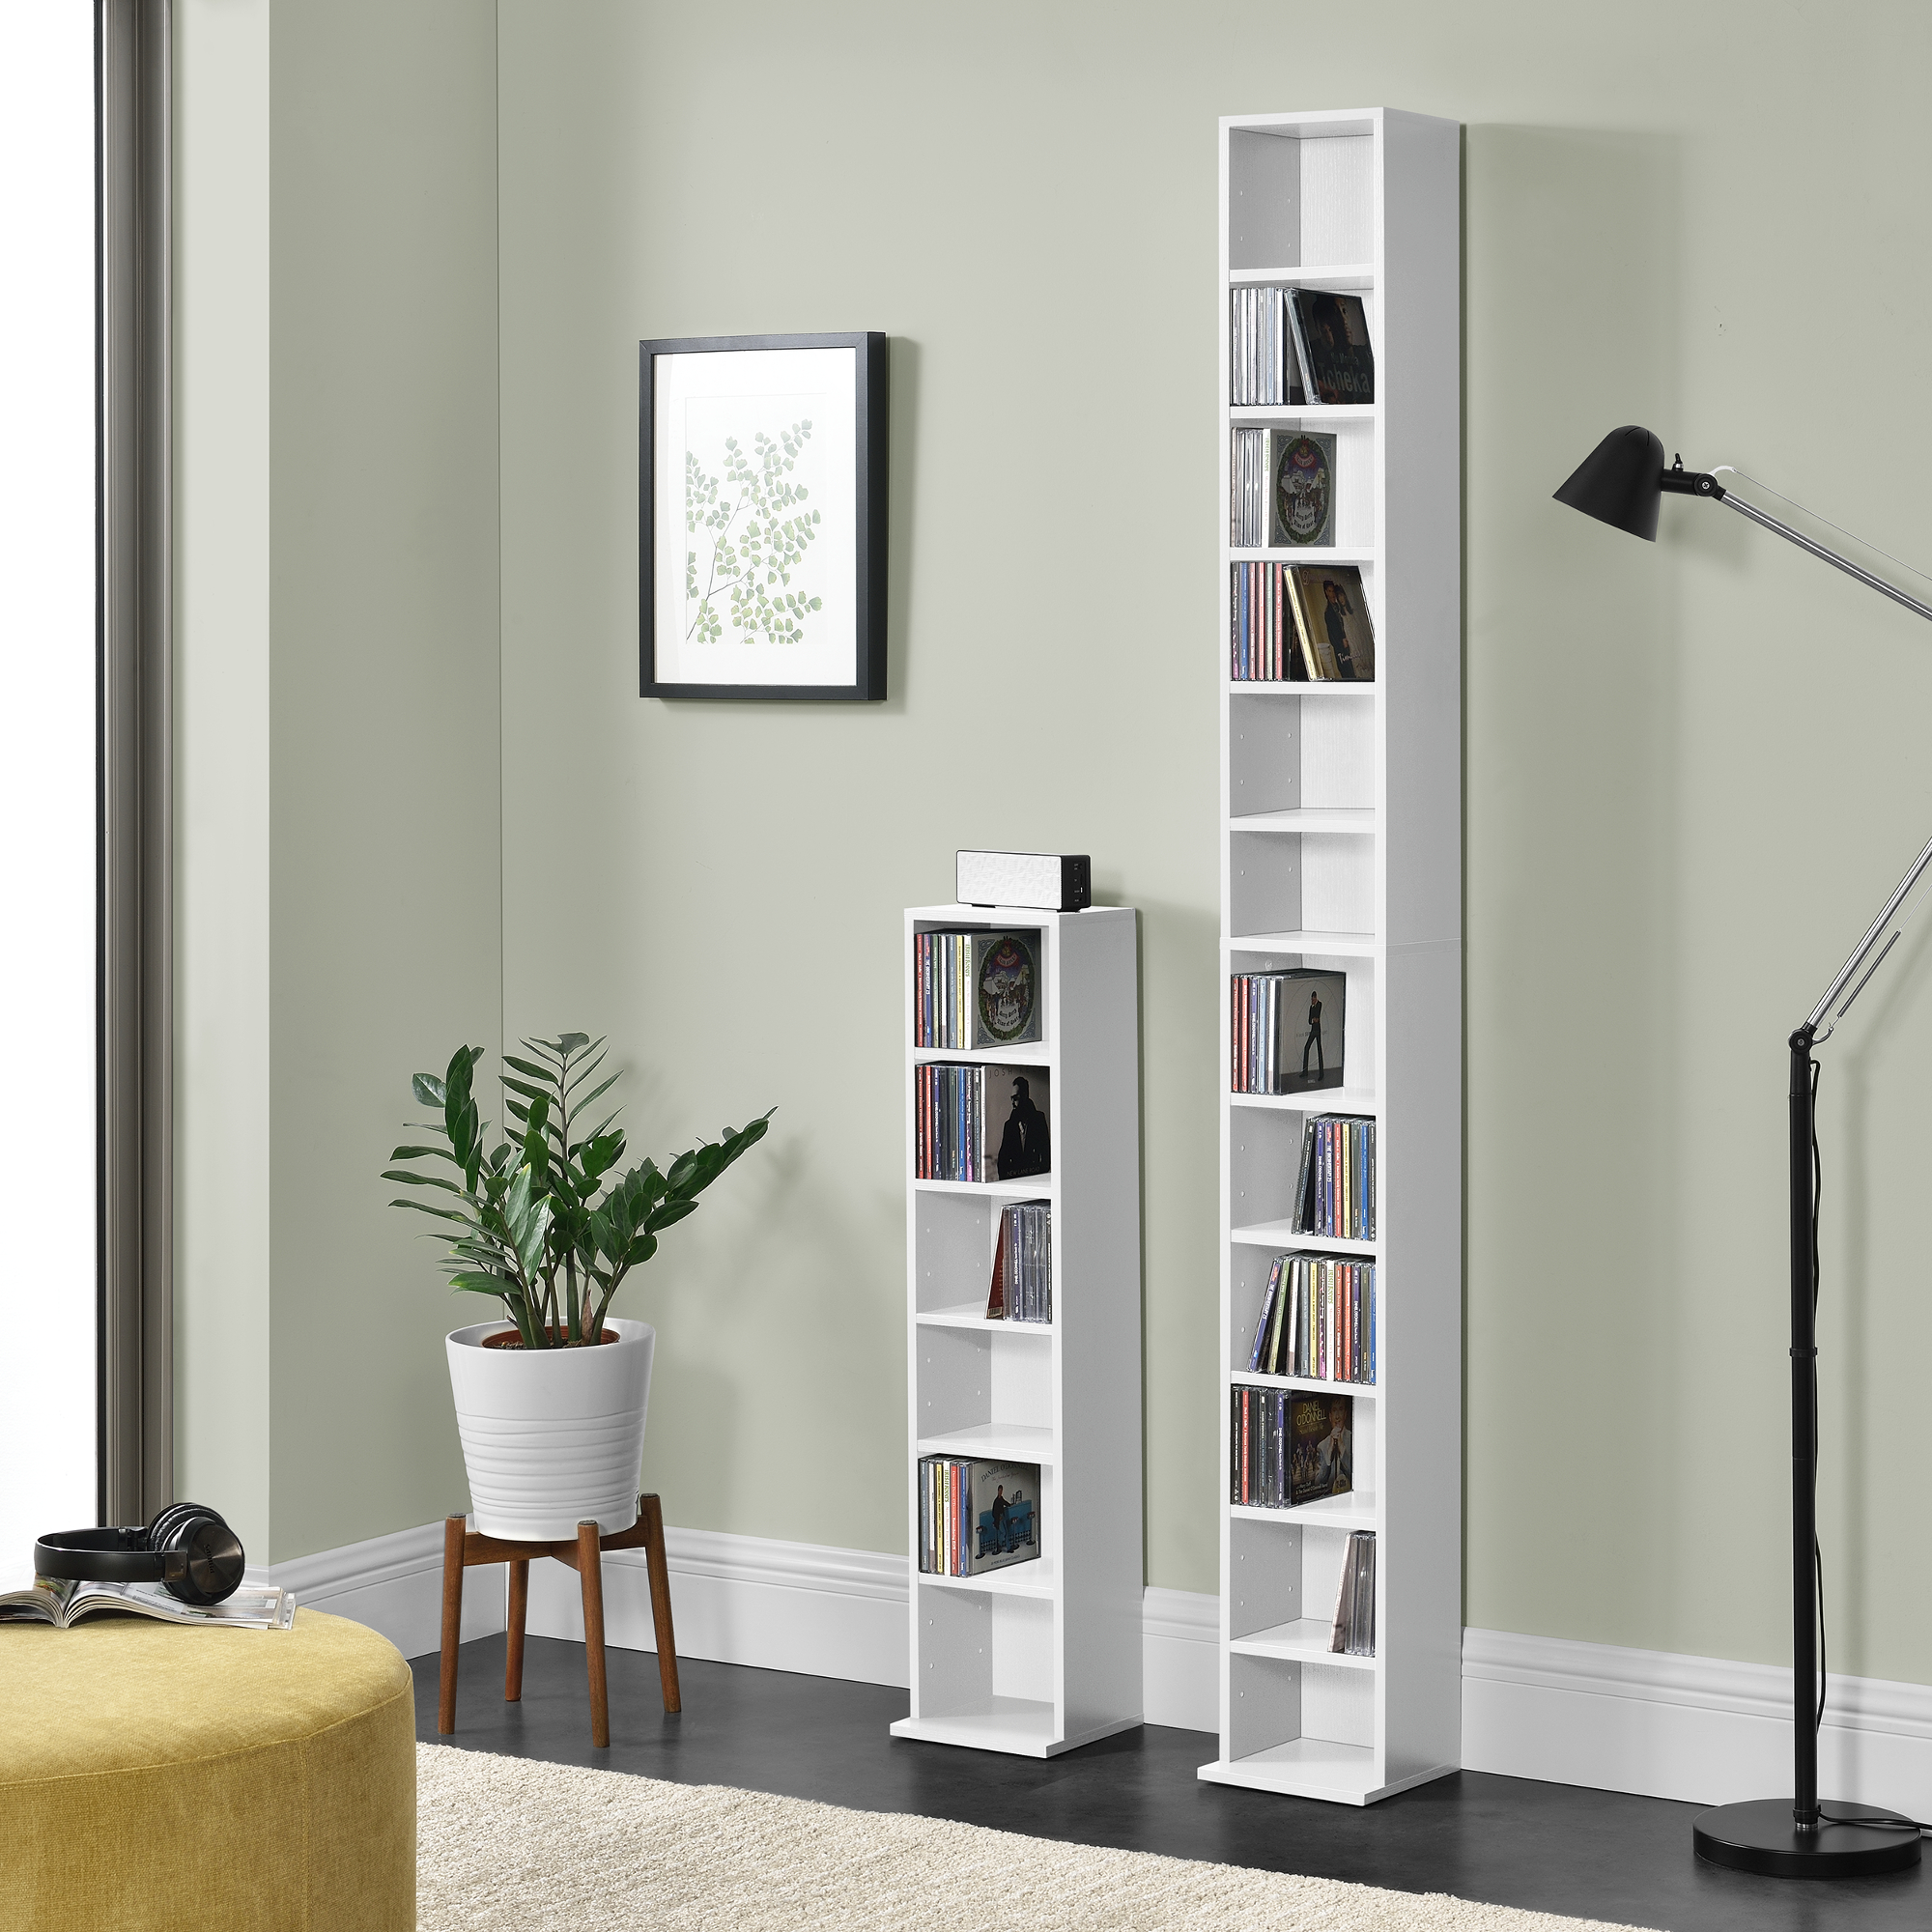 b cherregal cd regal standregal regal aufbewahrung 12. Black Bedroom Furniture Sets. Home Design Ideas